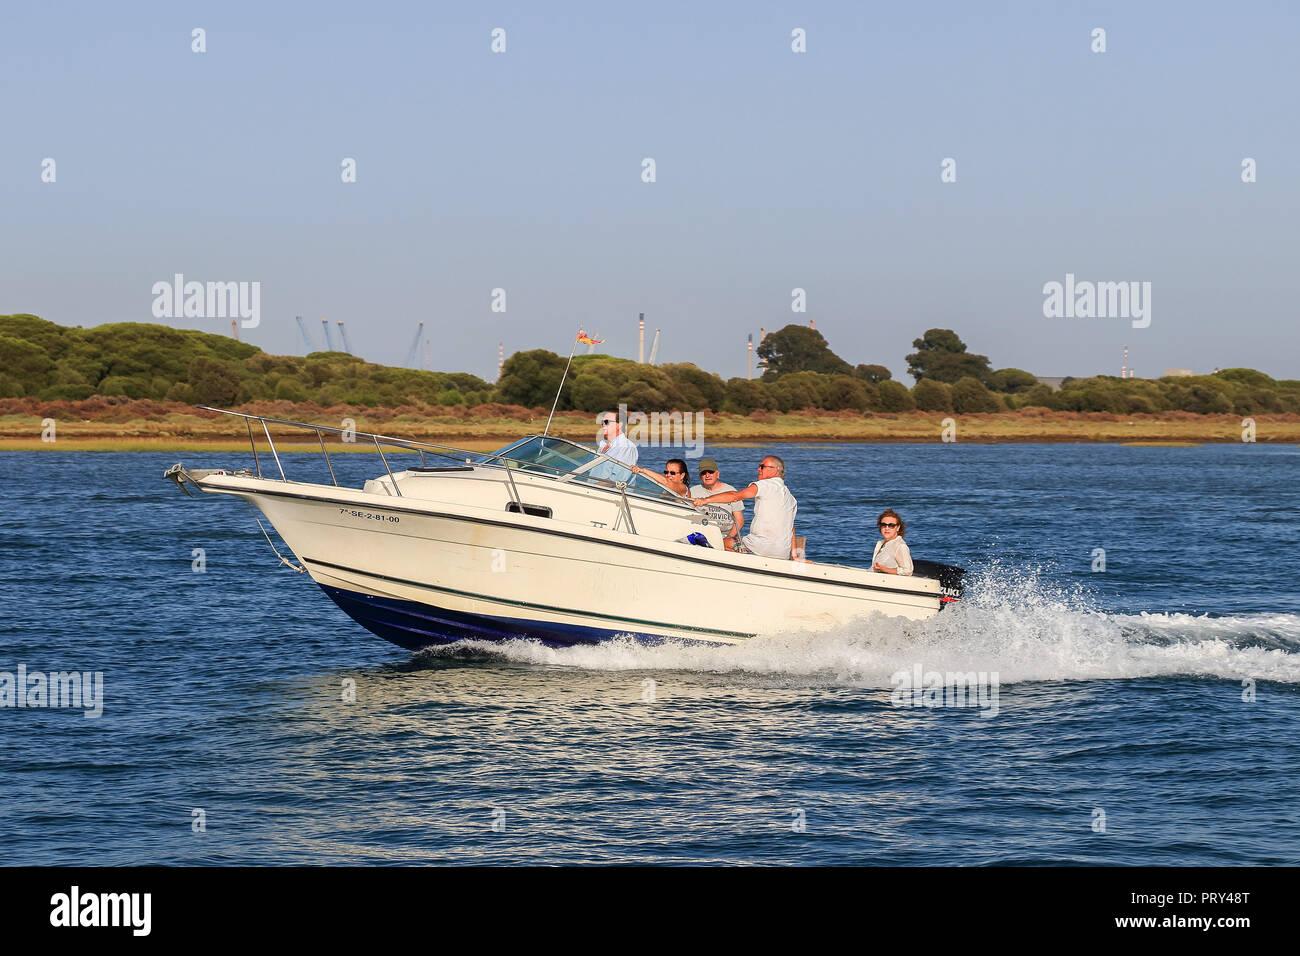 Huelva, Spain - July 16, 2017: Unidentified people enjoy activities on motor boat in Huelva bay - Stock Image